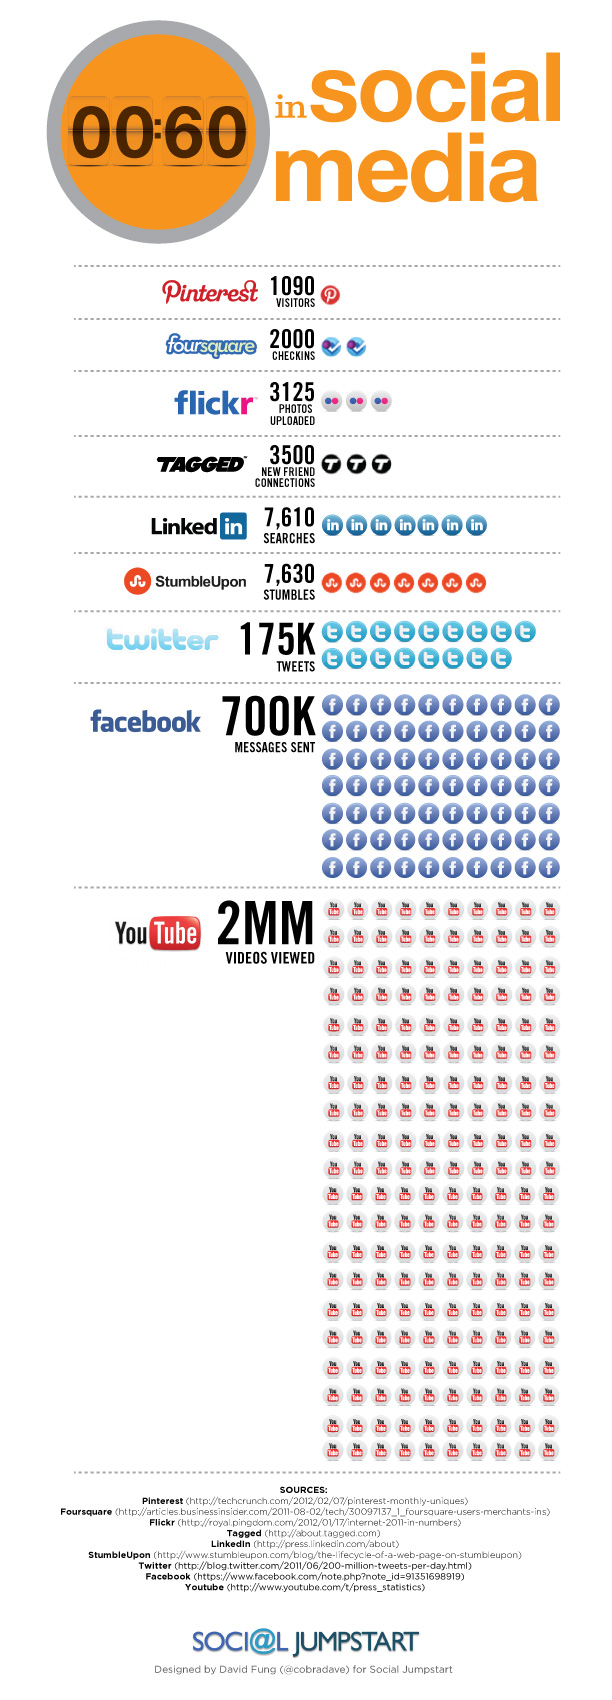 60 secondi sui Social Media